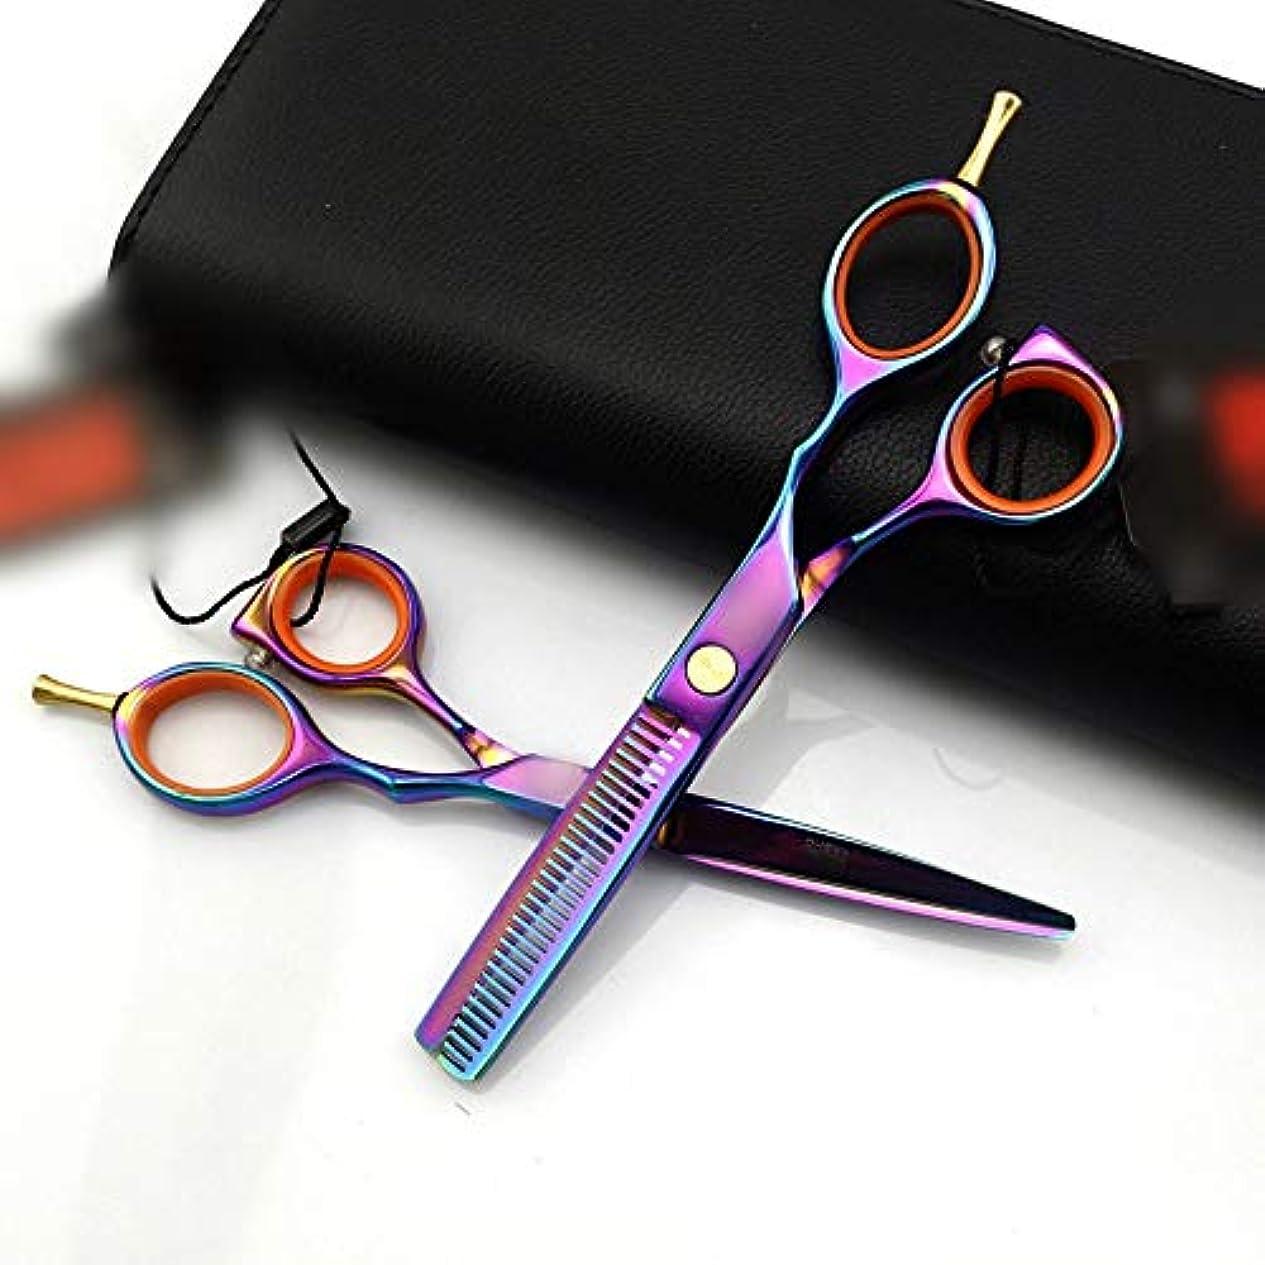 Goodsok-jp 5.5インチの多彩な専門の理髪はさみ、平らな歯の理髪はさみセット (色 : Colors)